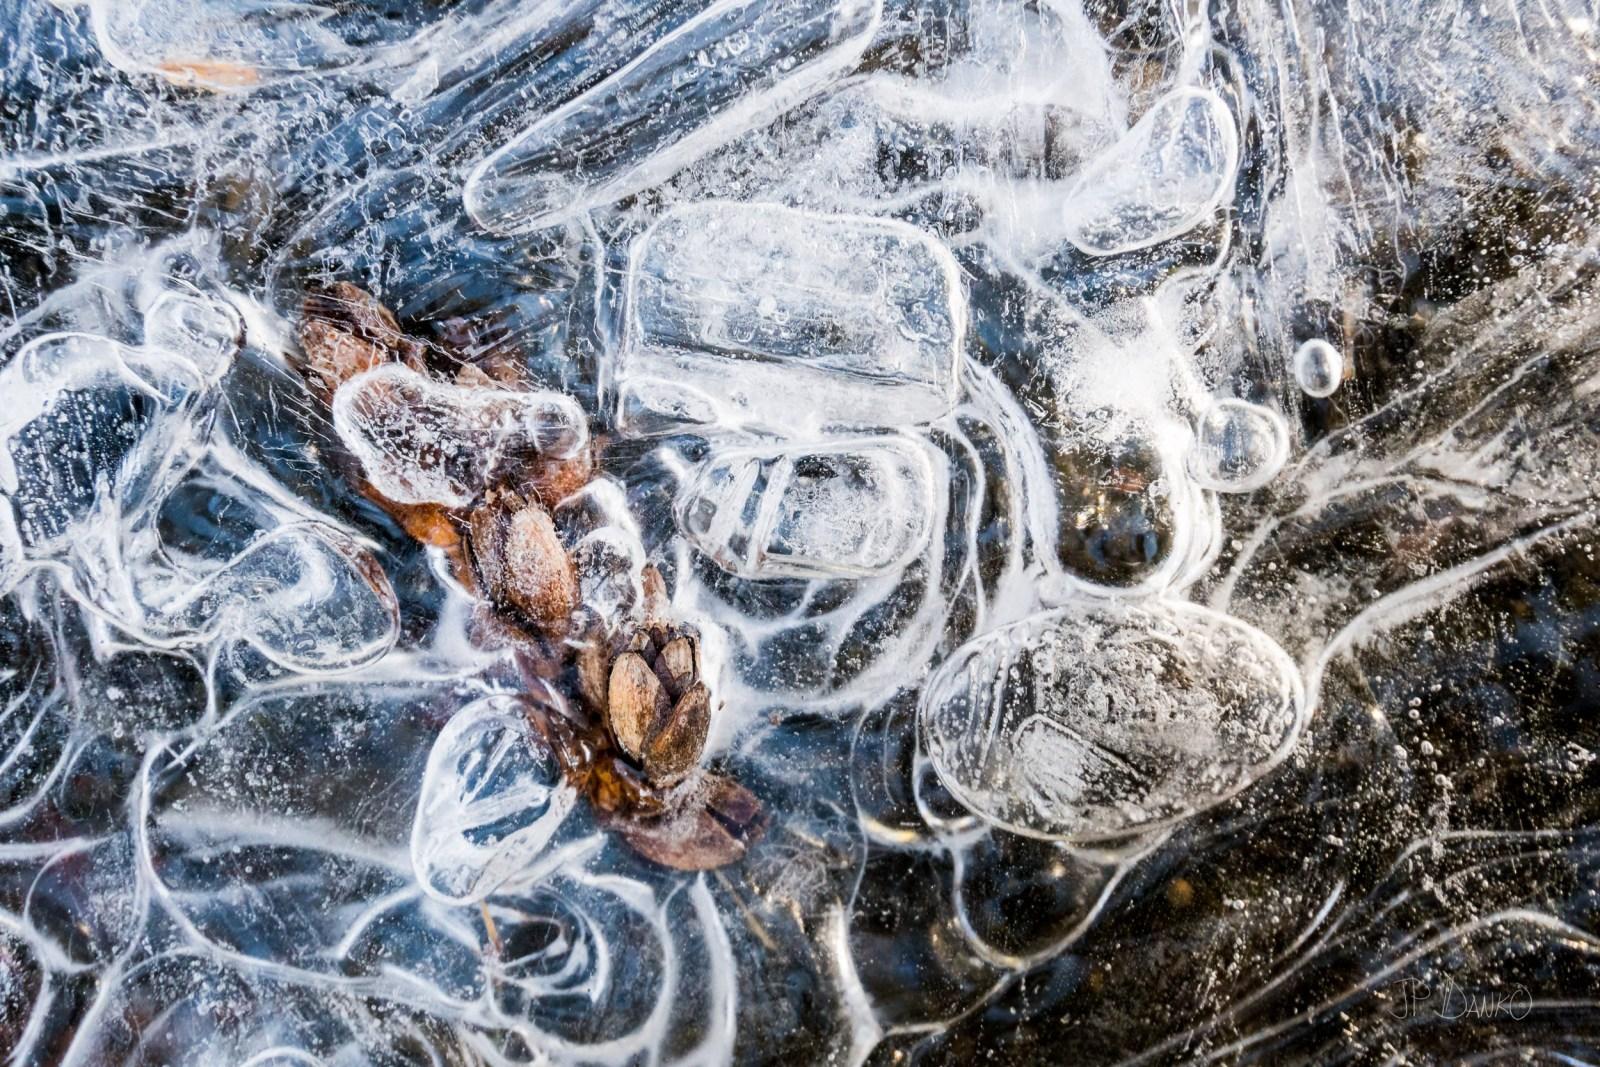 Swirls of fragile ice surround pebbles along shore of lake